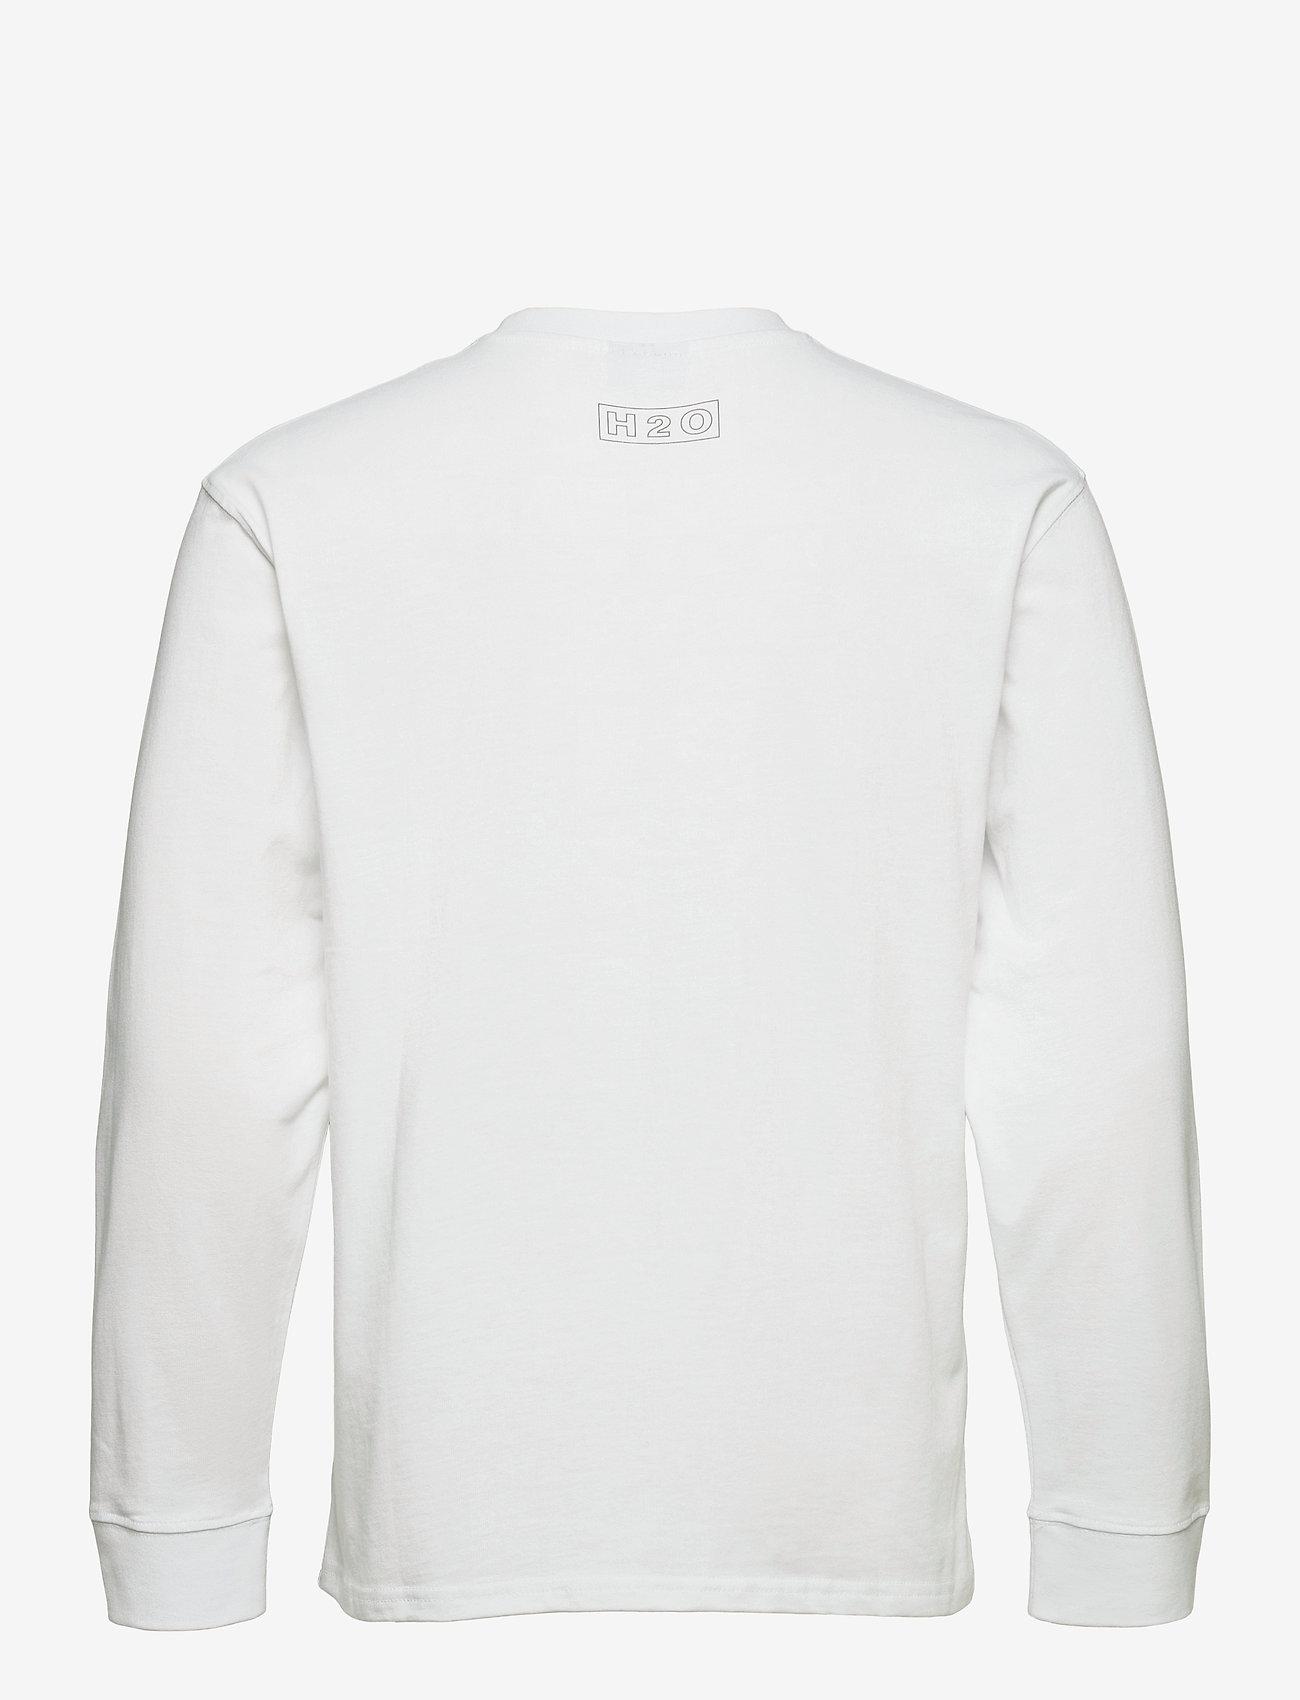 H2O - Romø Tee L/S - pitkähihaiset - white - 1